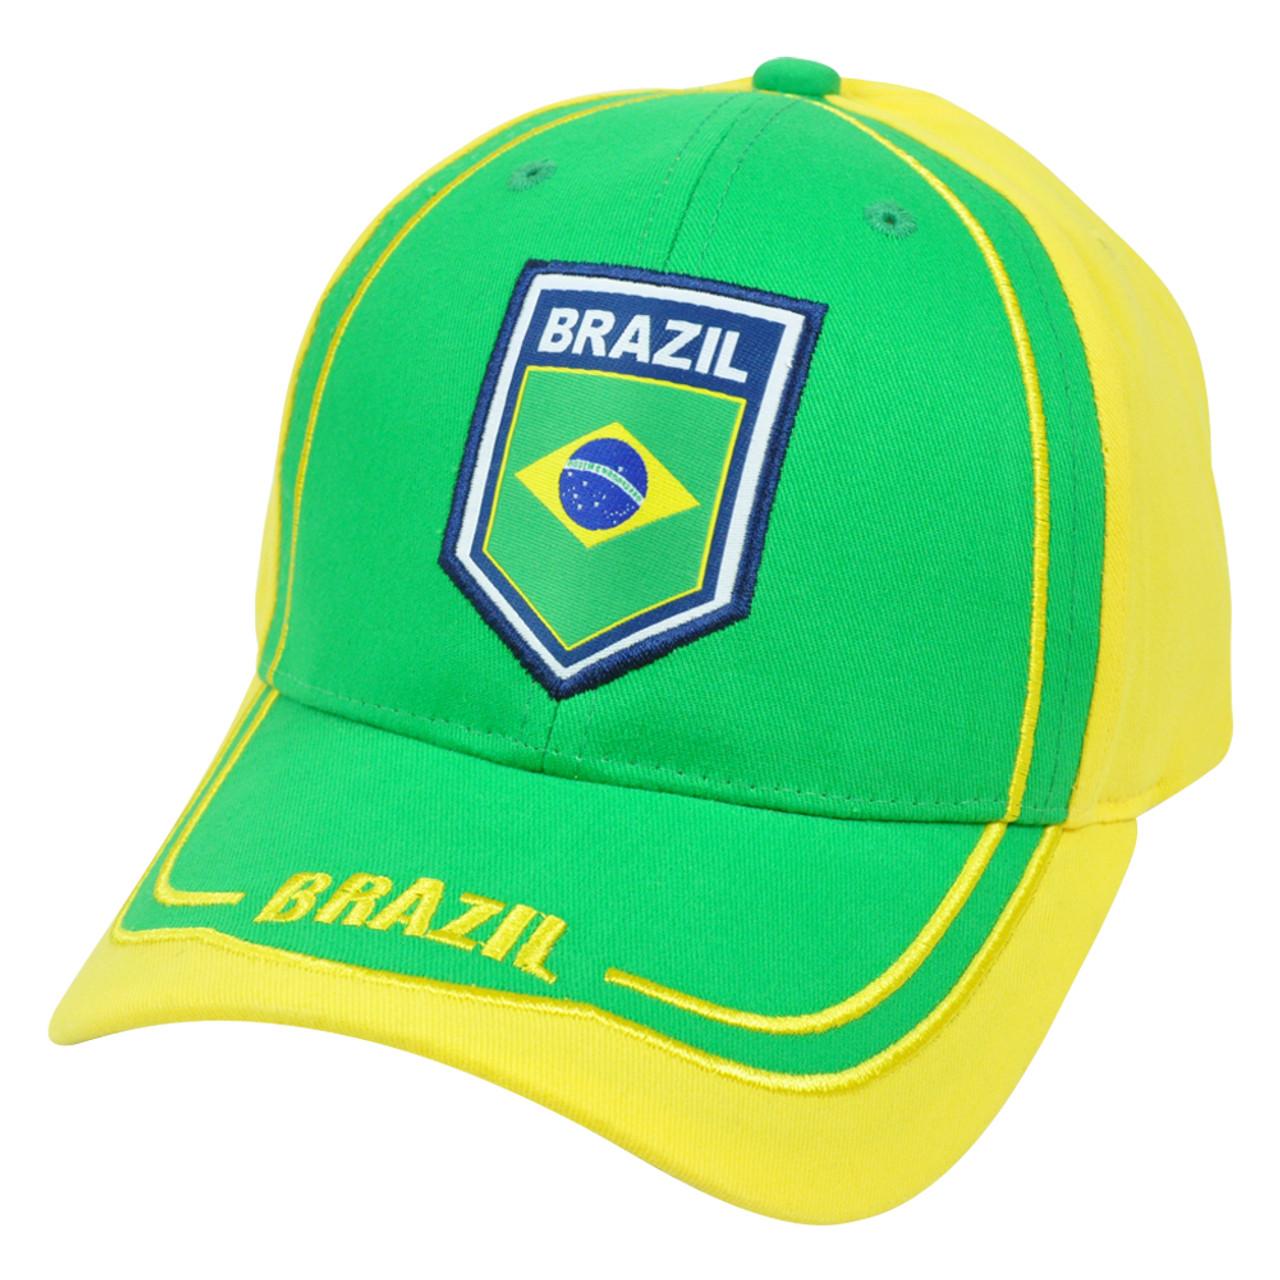 77447985617 Brasil Brazil Hat Cap Gorra Soccer Flag Futbol Football Rhinox CIS08  Adjustable - Cap Store Online.com